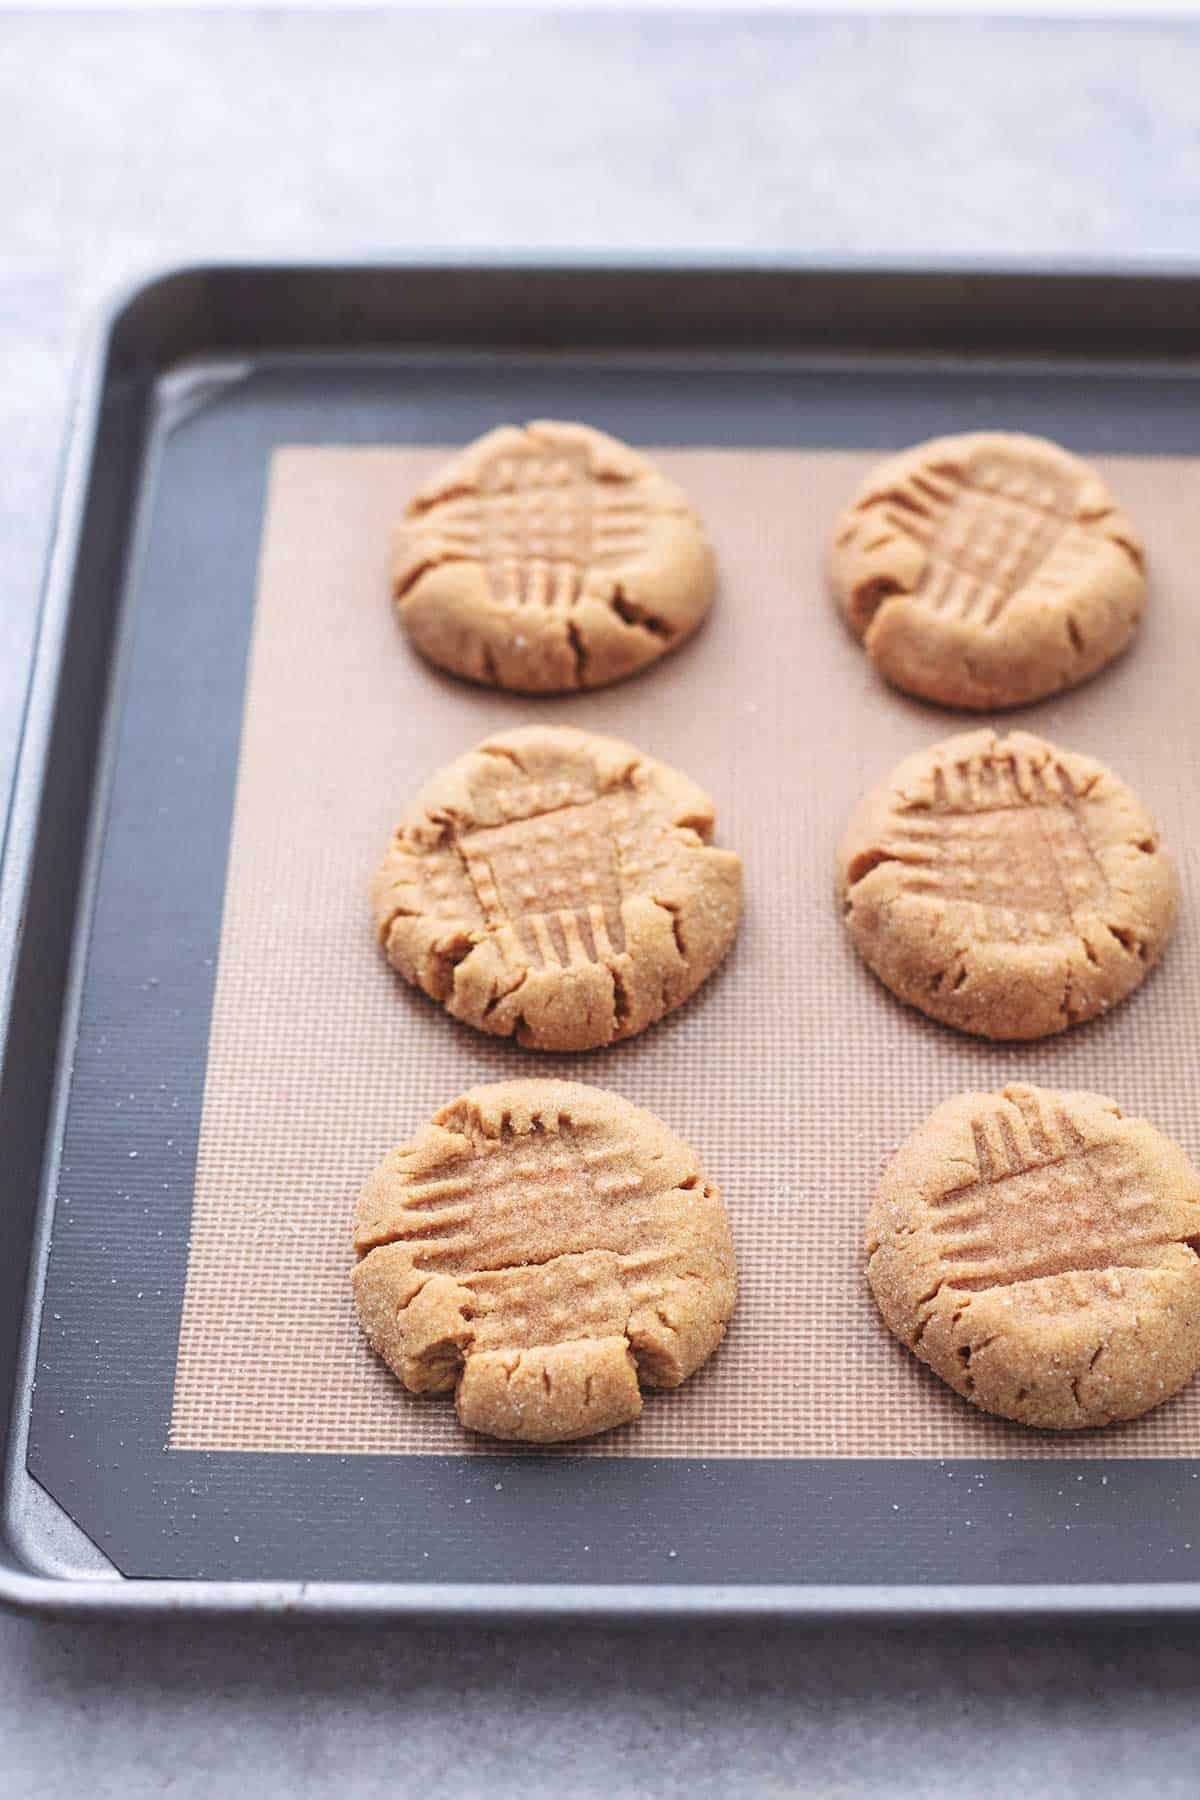 baked cookies on silpat mat on baking sheet